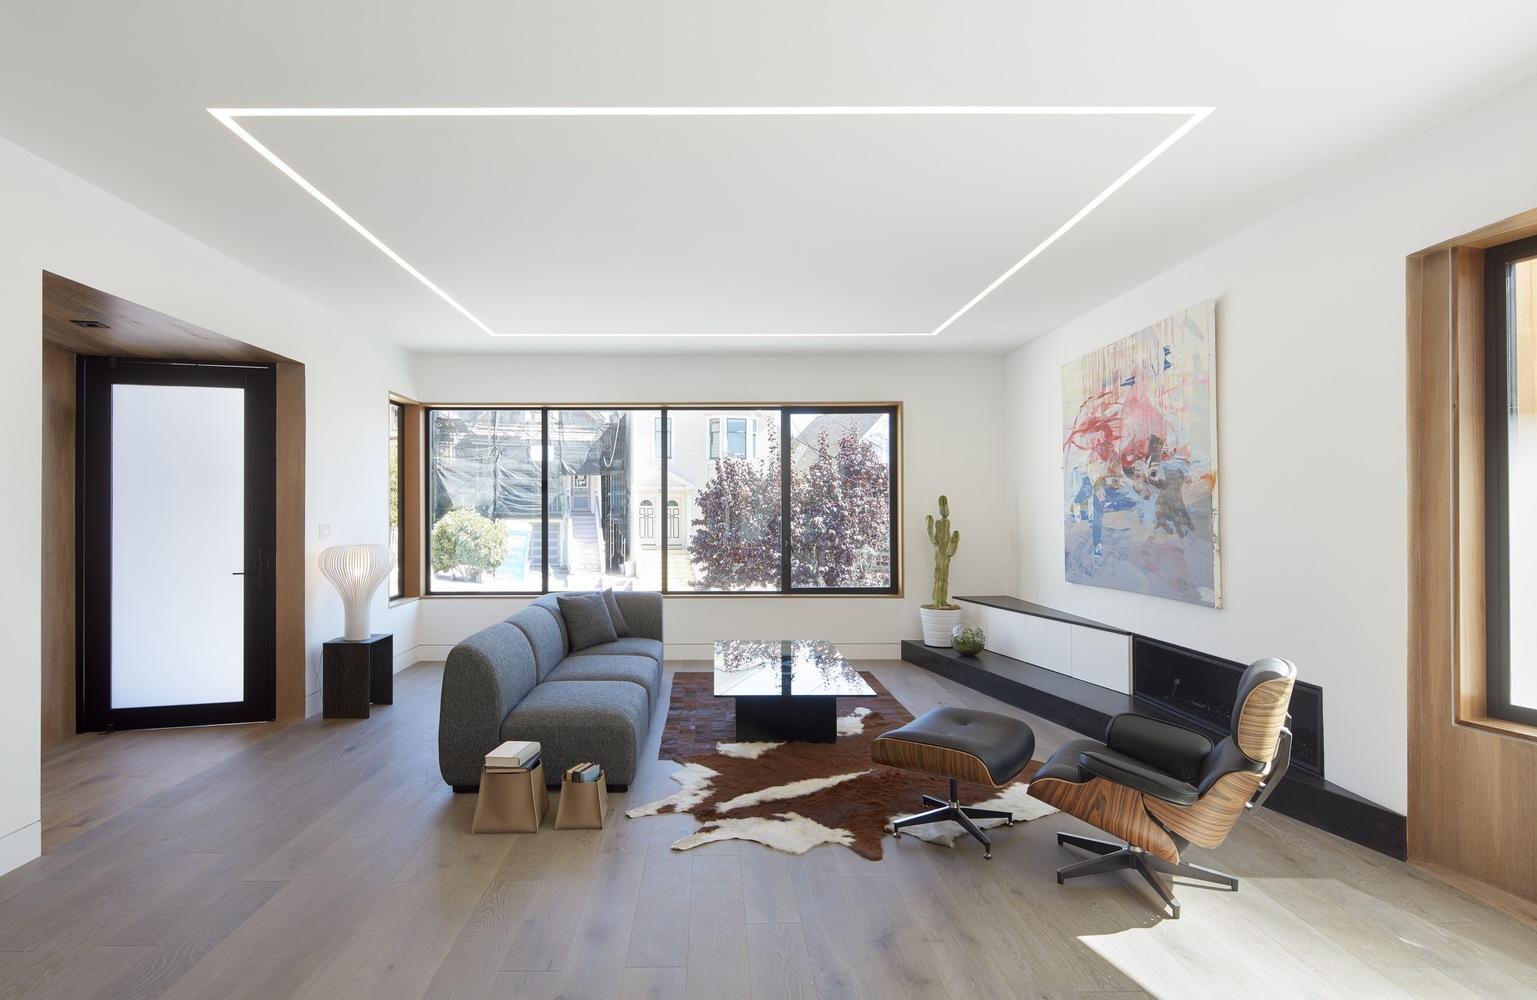 6_Noe Valley House_IwamotoScott Architecture_Inspirationist